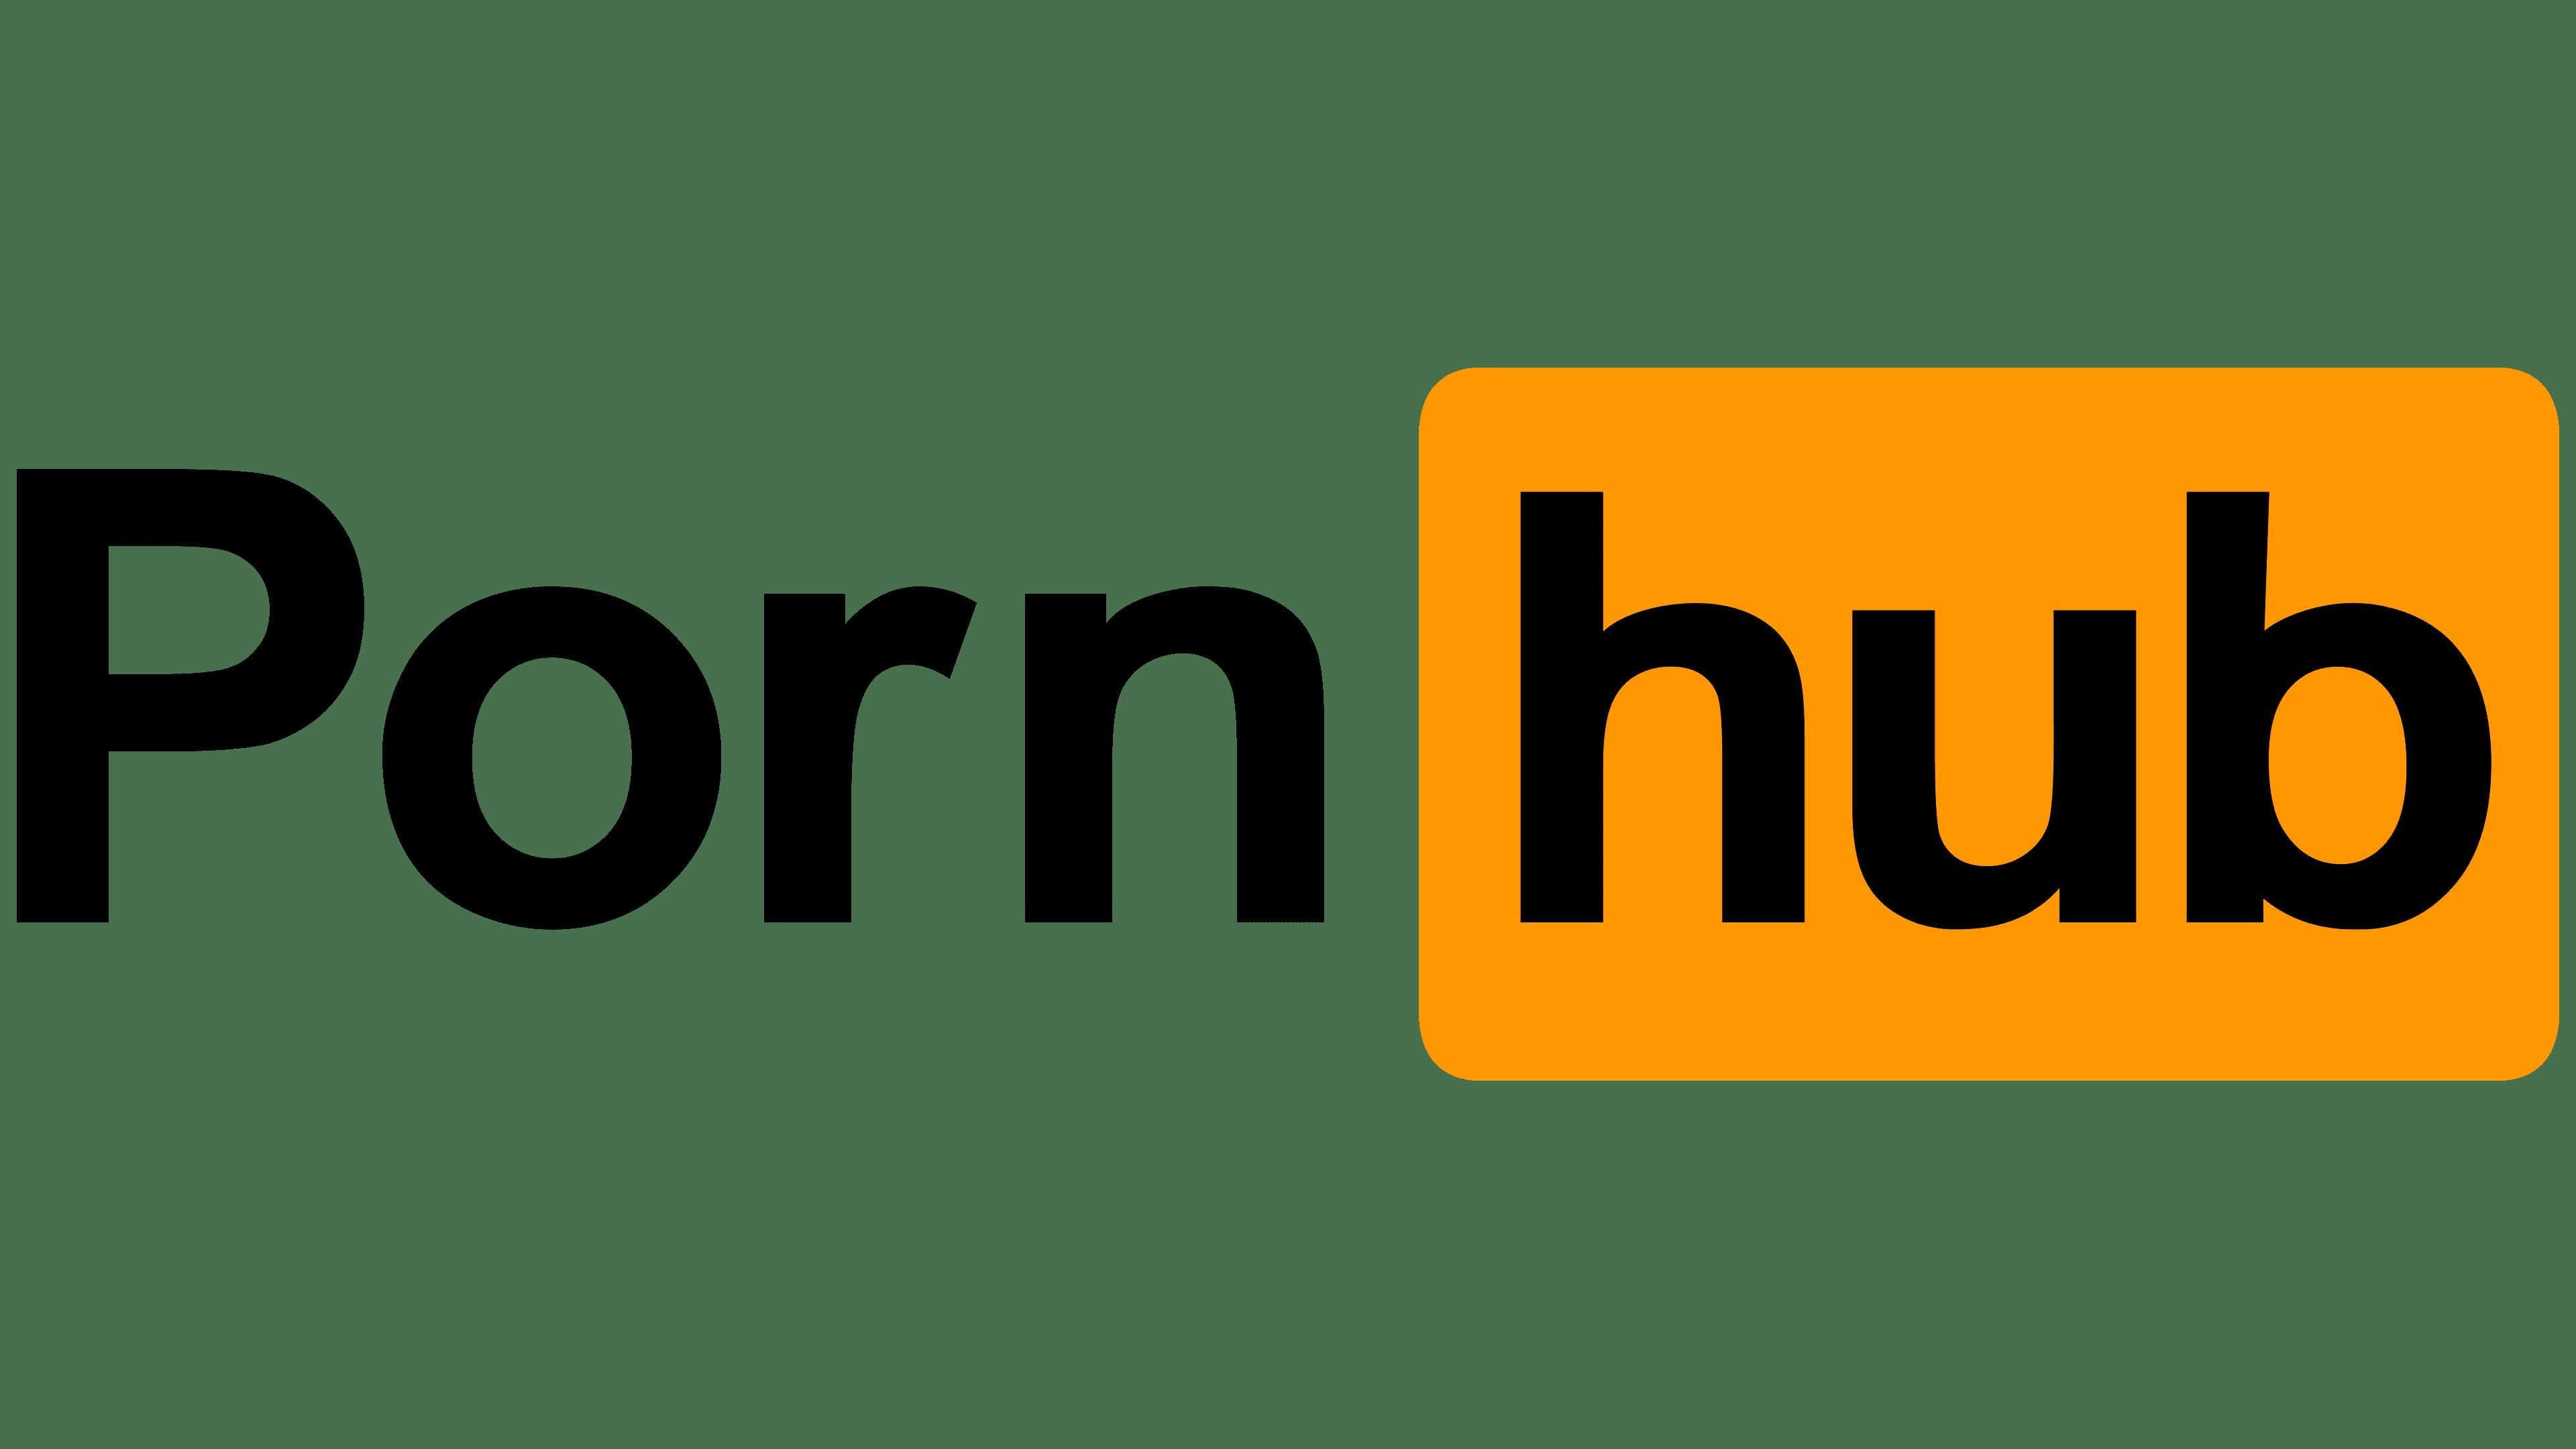 Pornhub Logo Logo